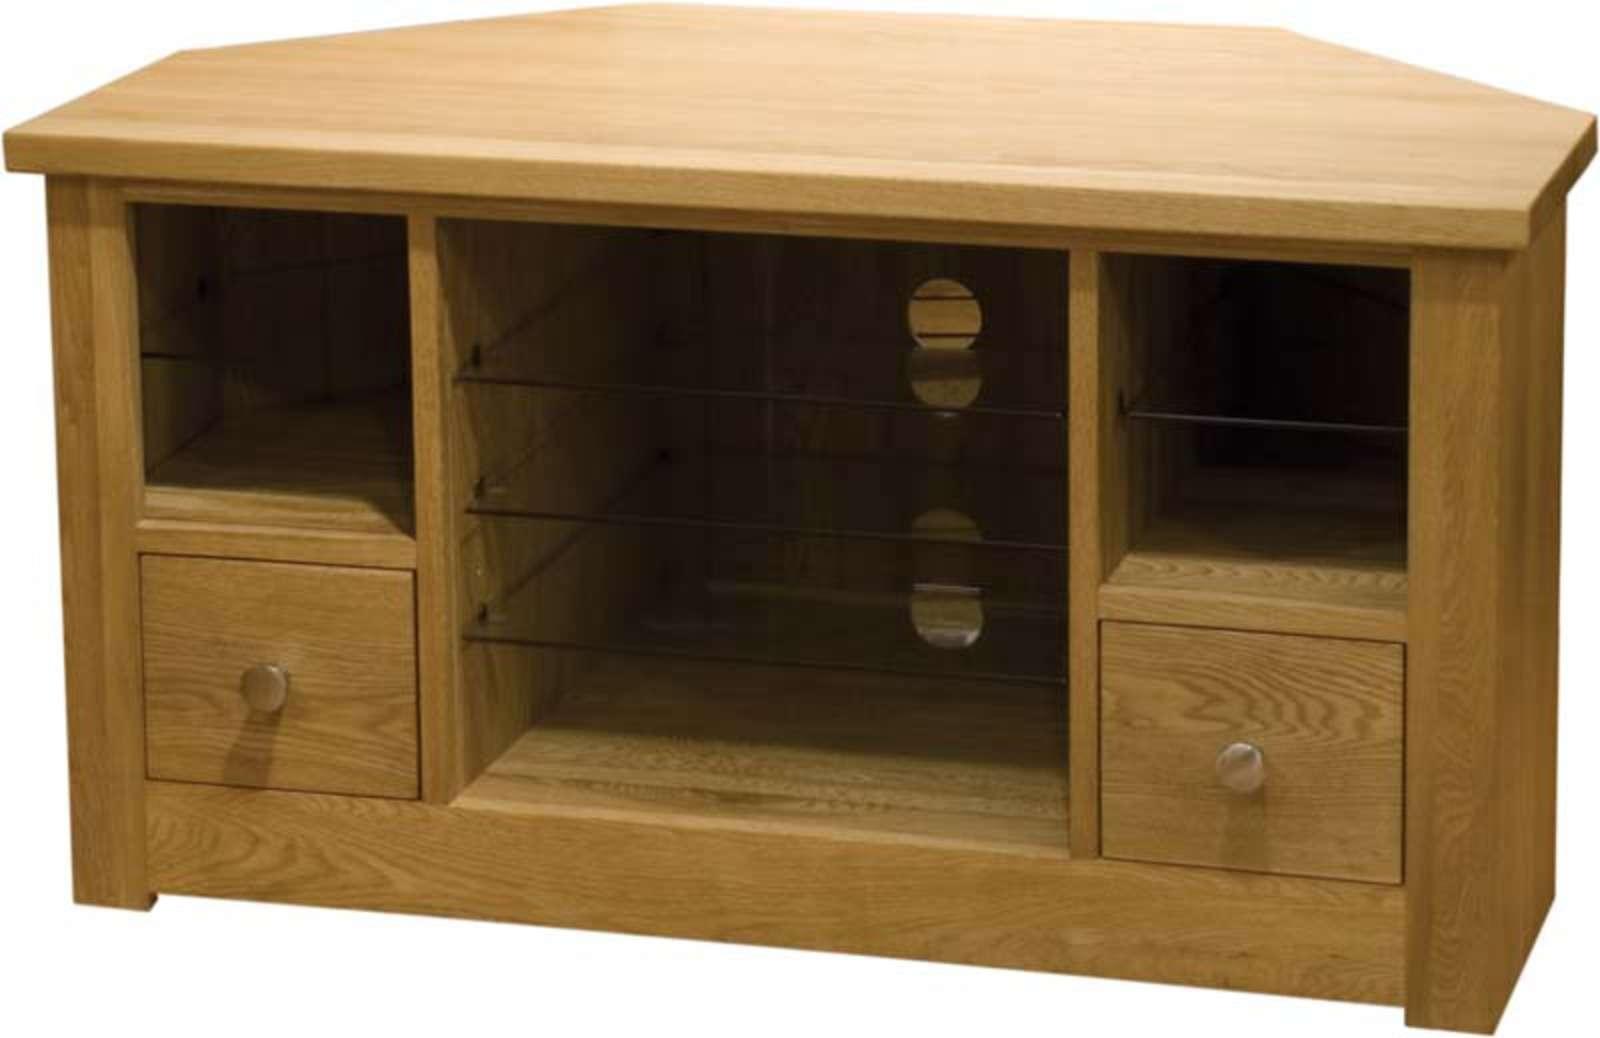 Oak Corner Tv Unit – Pine, Oak, Painted And Bespoke Furniture Regarding Painted Corner Tv Cabinets (View 12 of 20)